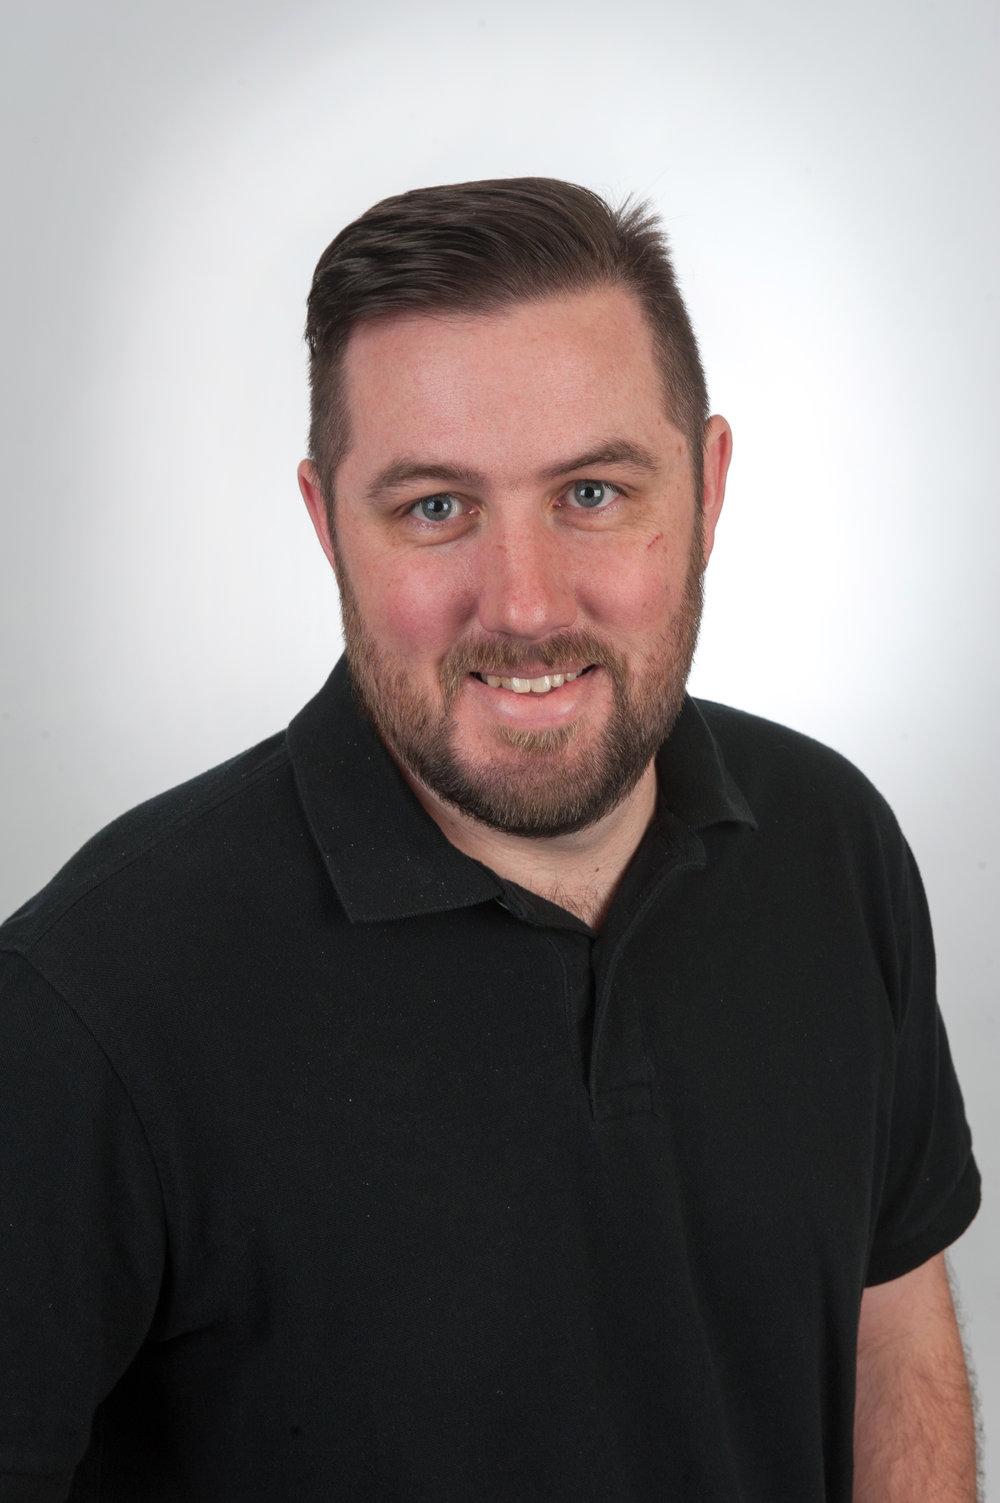 CLINT CRONIC - Director 2018